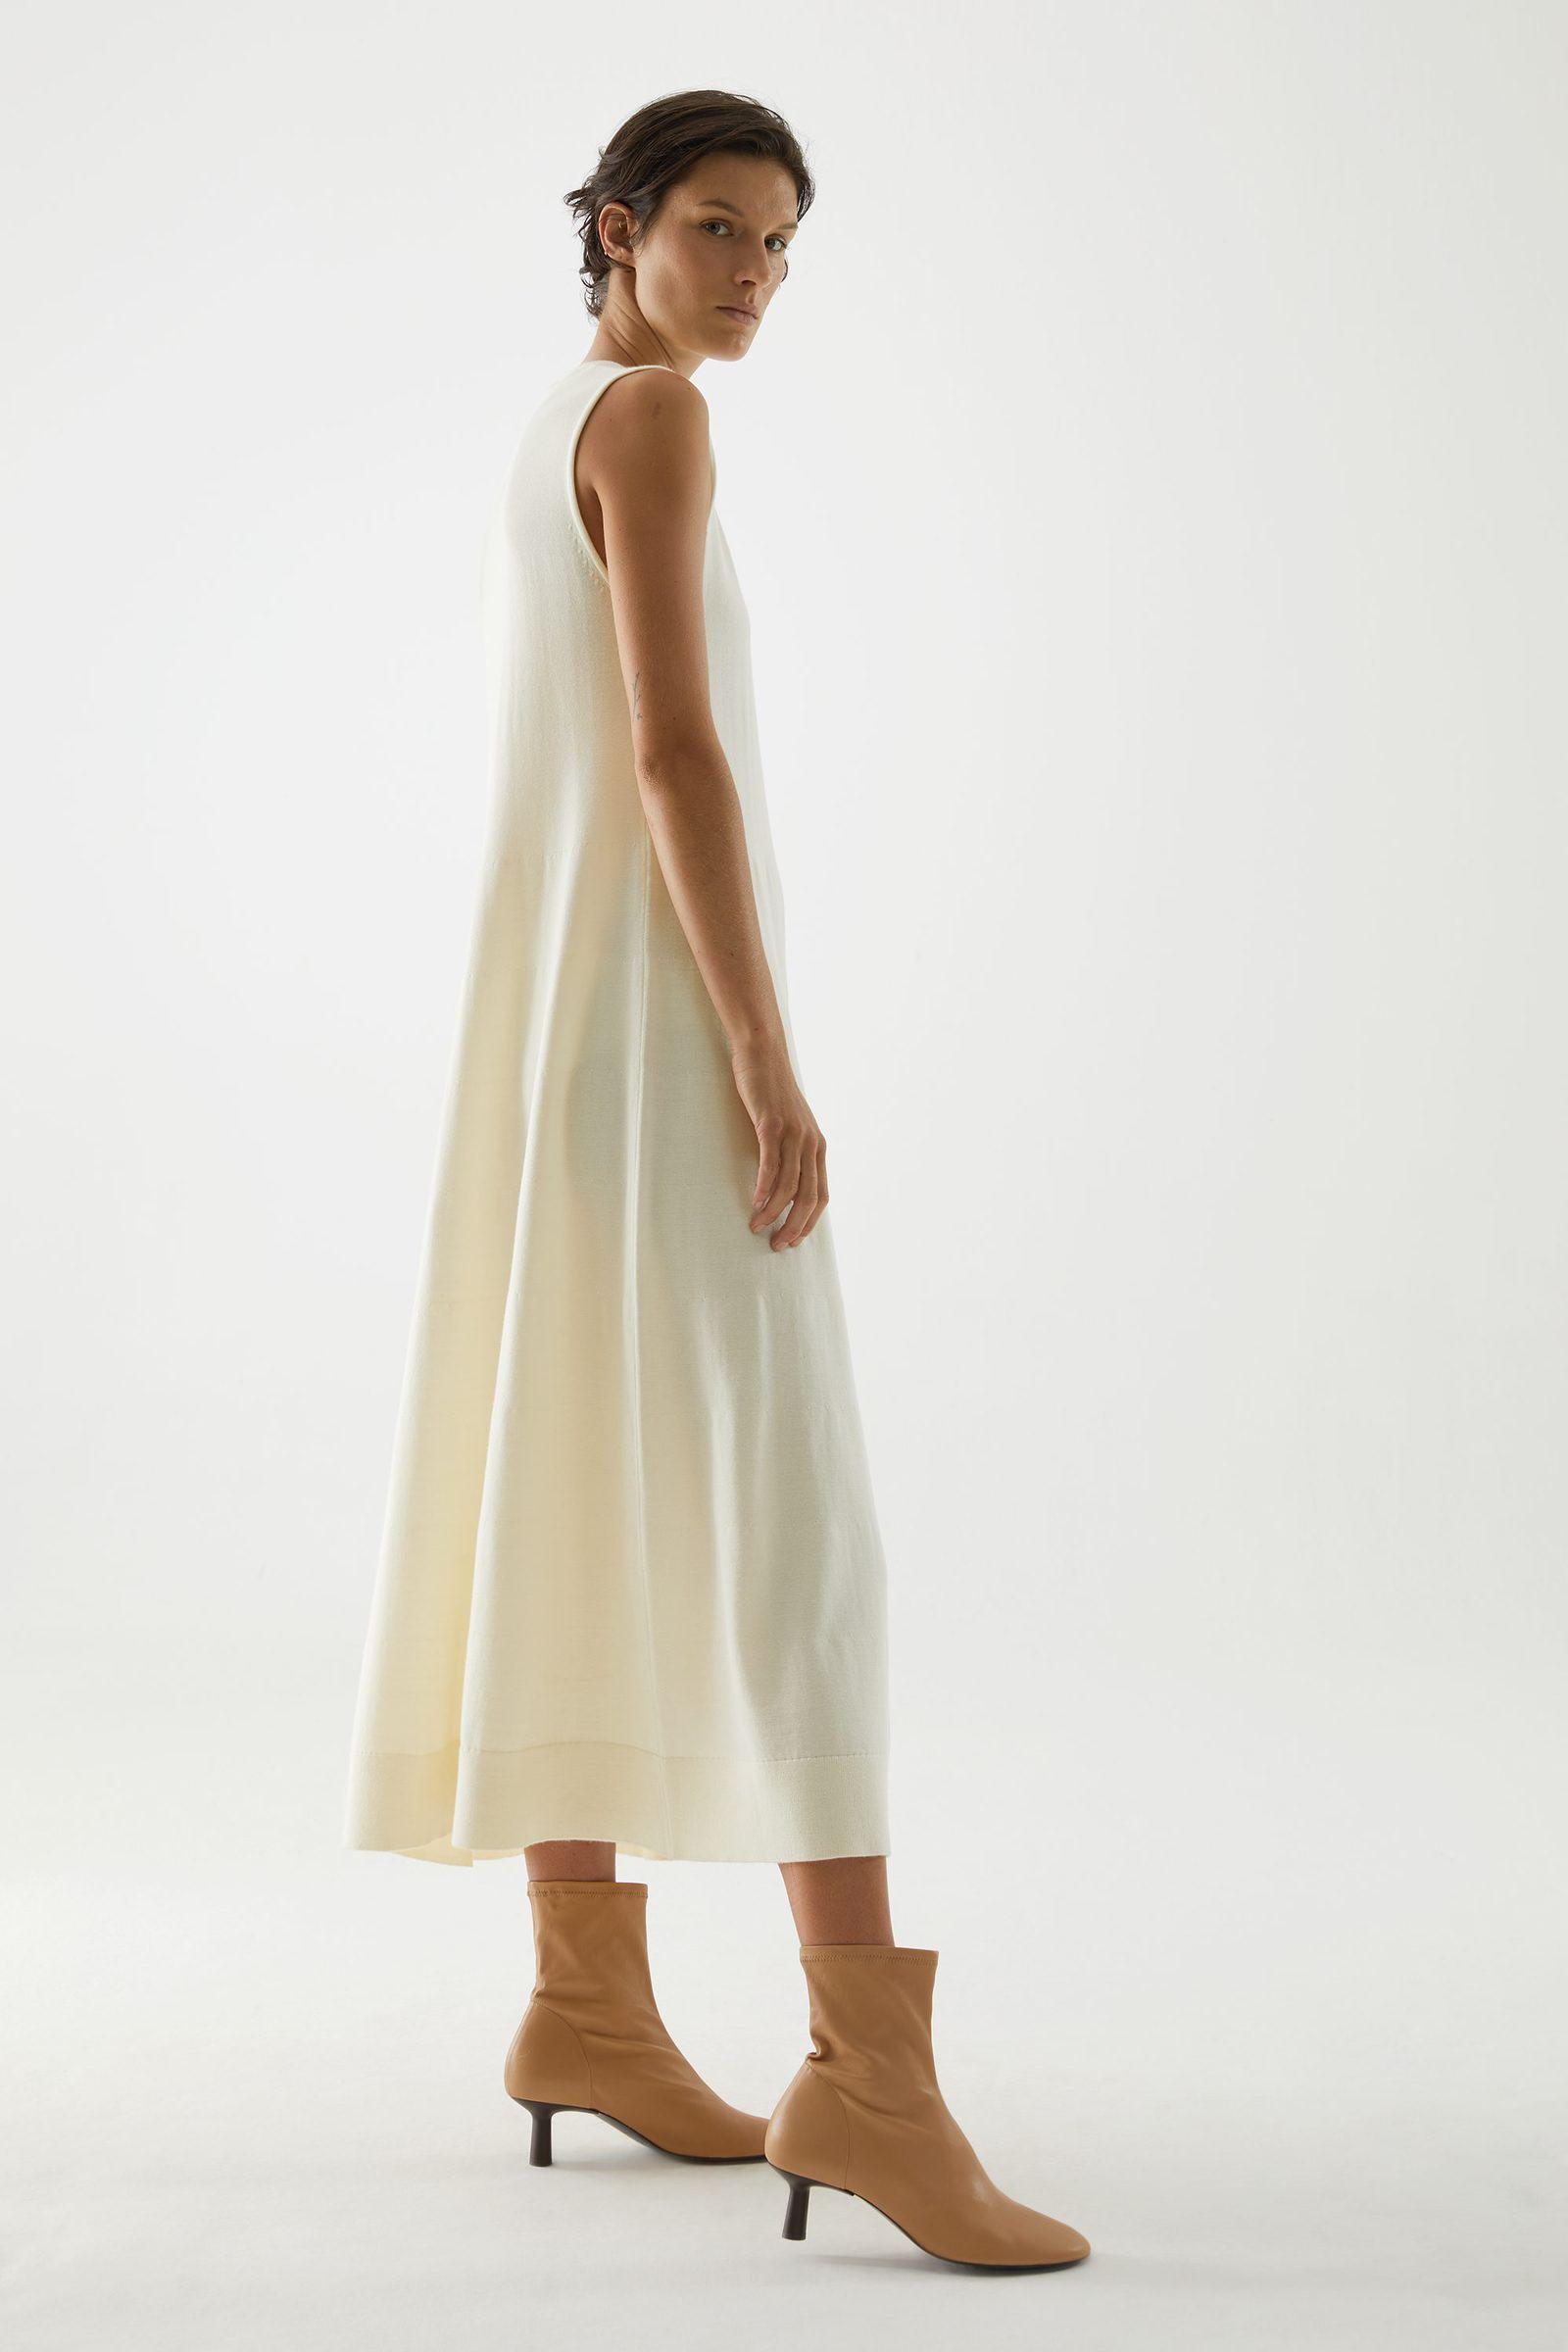 COS 니티드 A라인 메리노 울 드레스의 오프 화이트컬러 ECOMLook입니다.